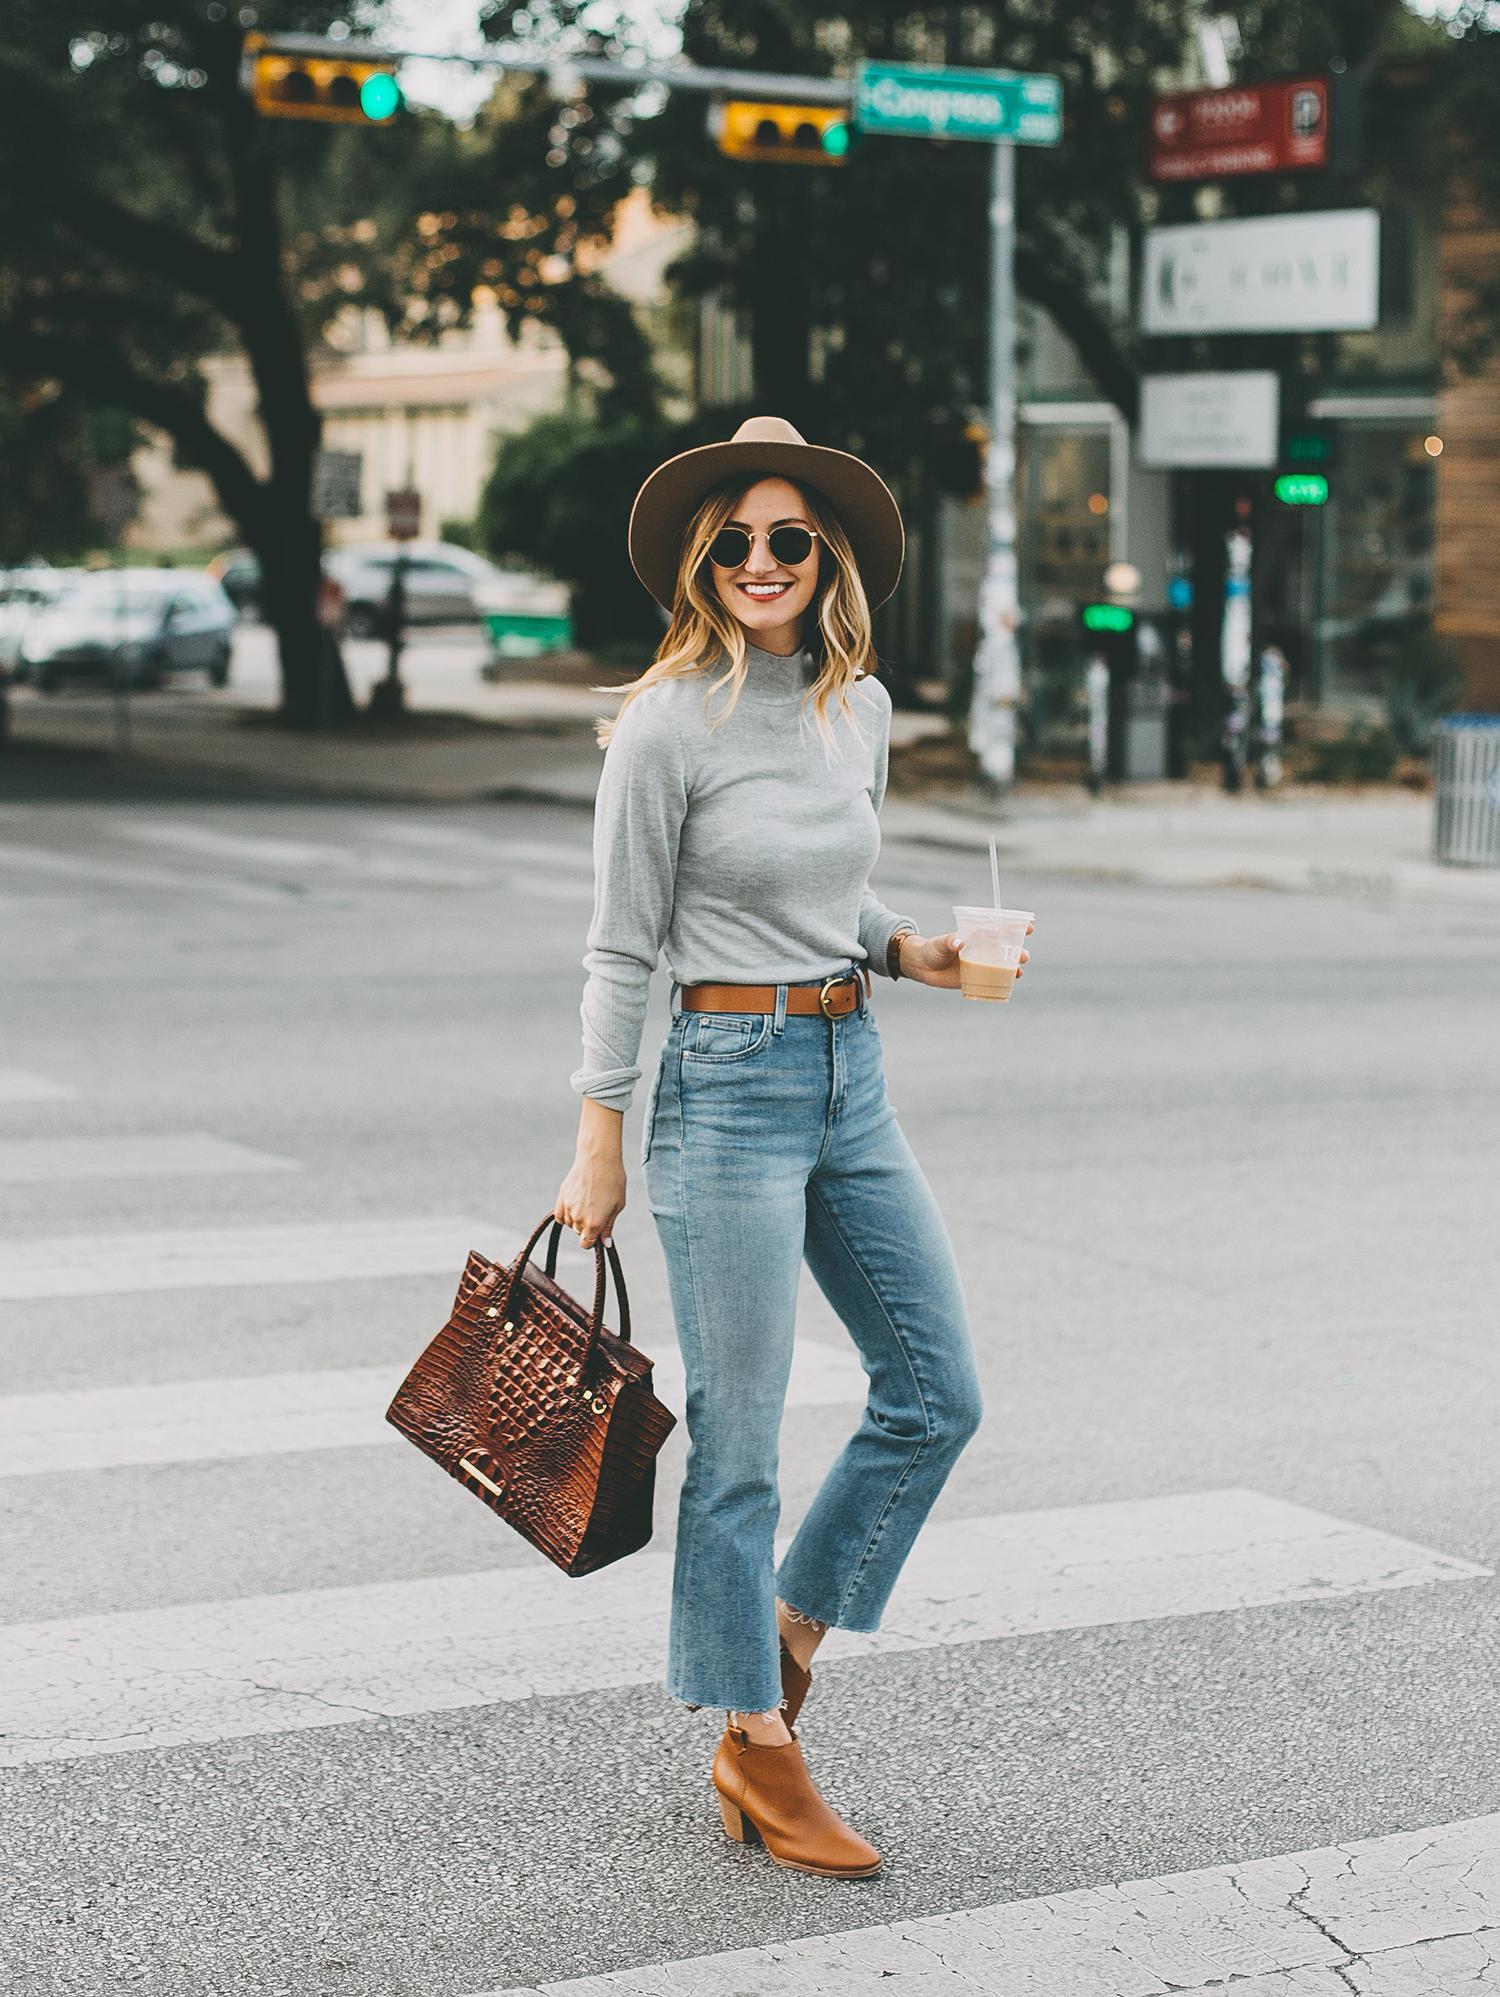 livvyland-blog-olivia-watson-south-congress-avenue-austin-texas-fashion-life-style-blogger-bdg-high-waist-crop-flare-jeans-2